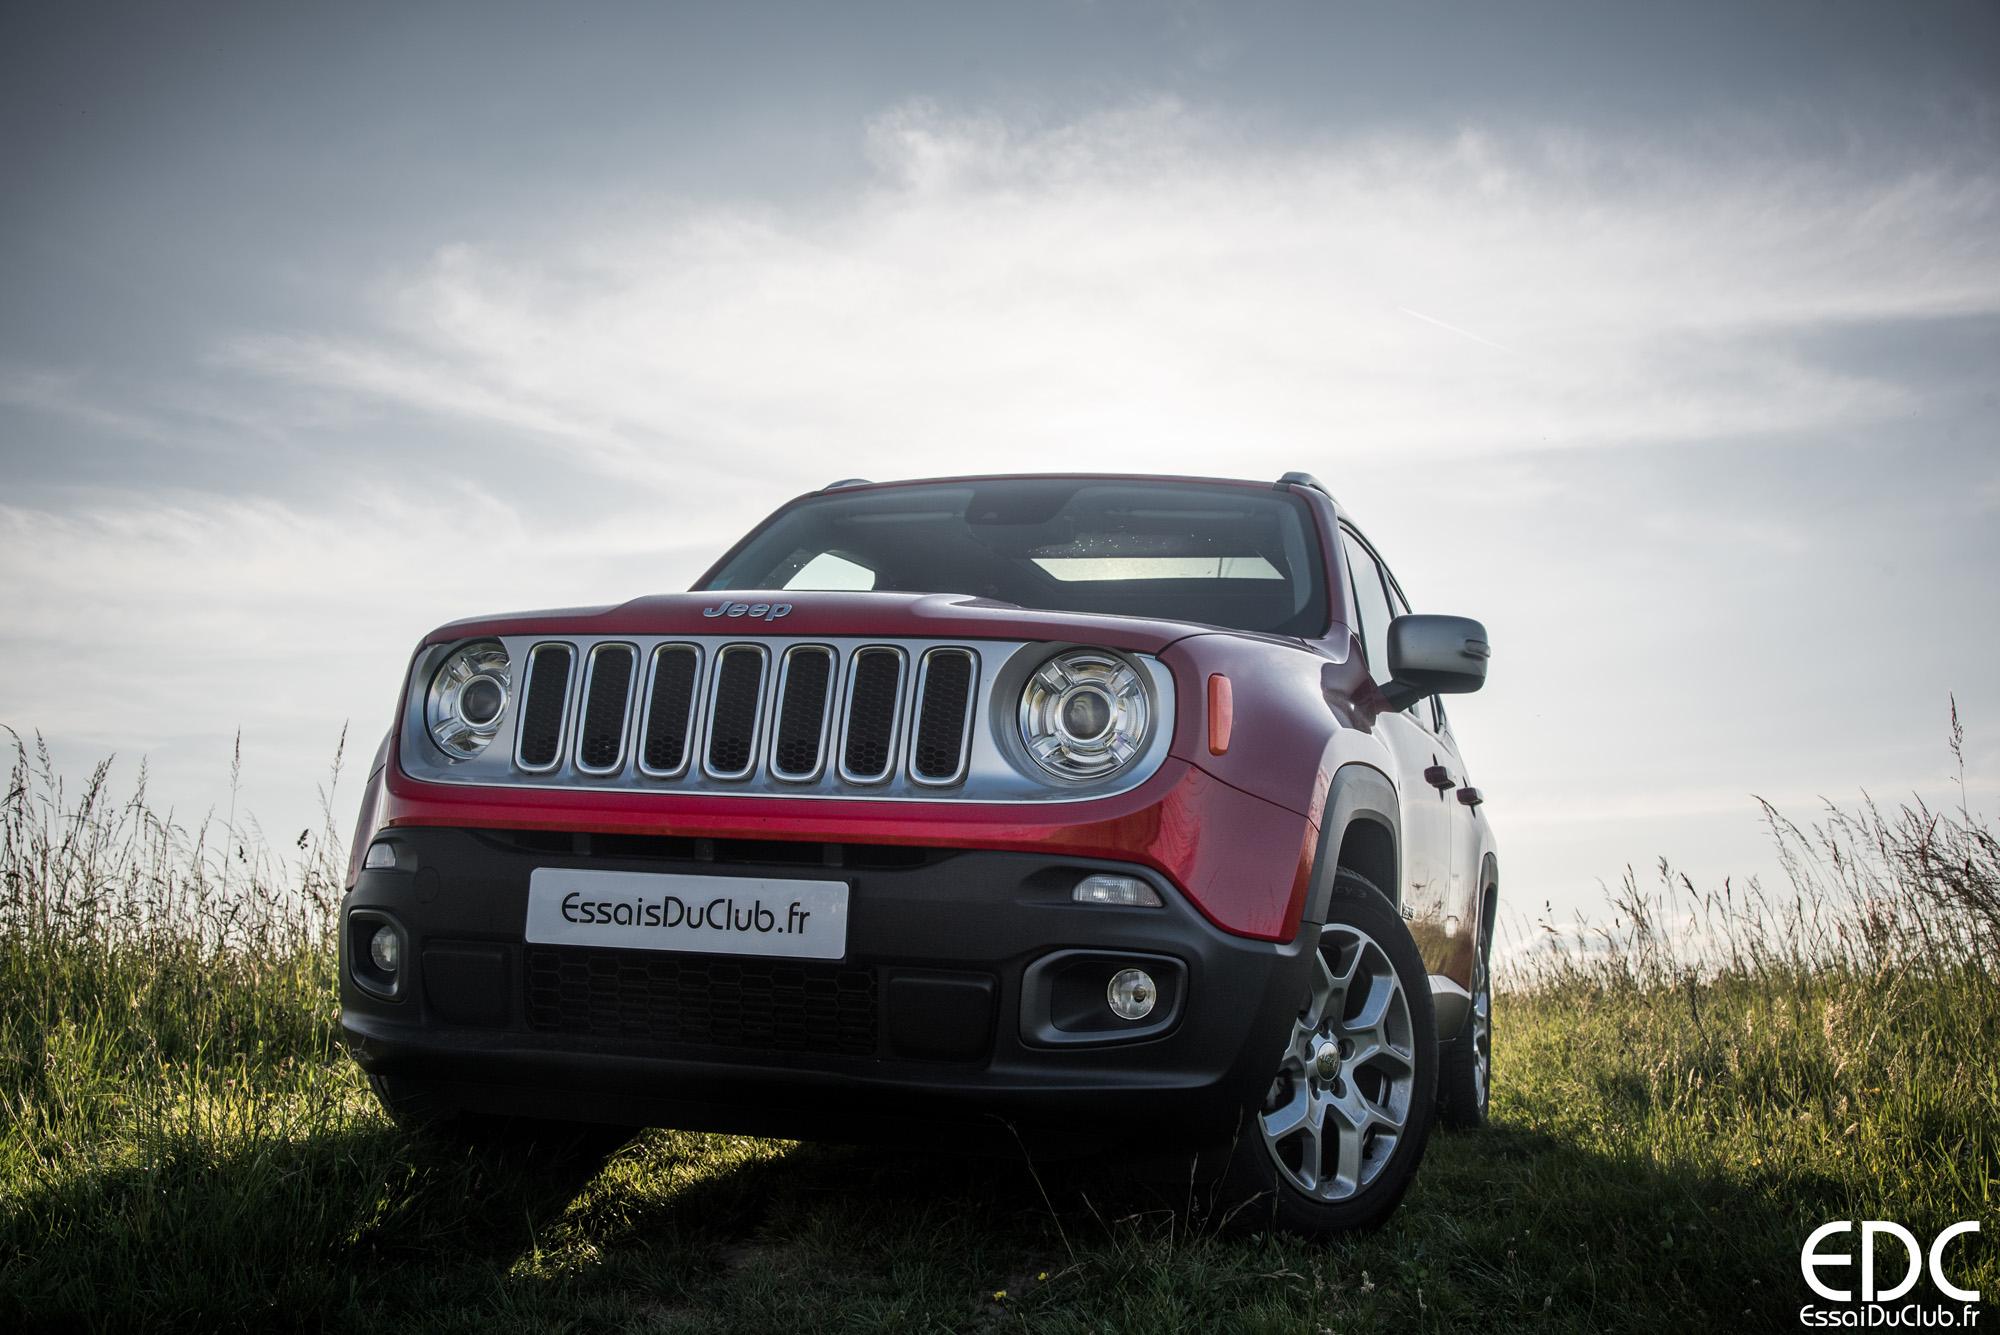 jeep renegade limited 1 4 multiair 140 bva6 essais du club. Black Bedroom Furniture Sets. Home Design Ideas